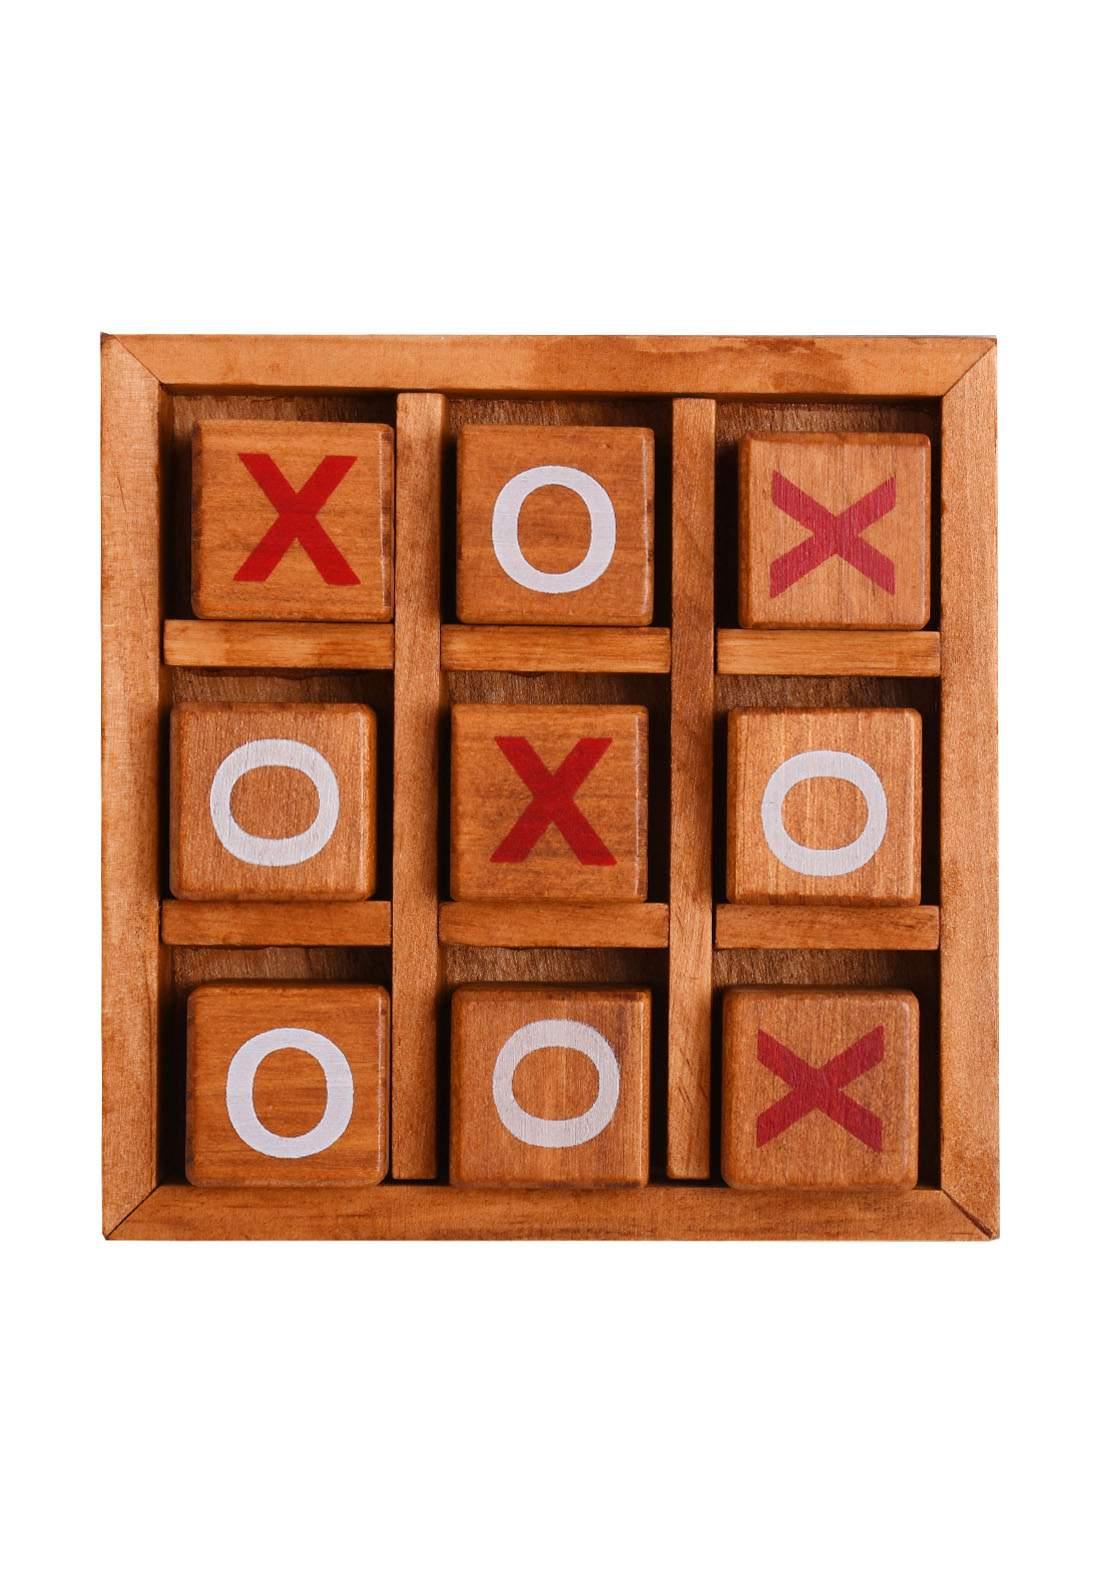 Wooden X-O Game لعبة أكس -أو الخشبية